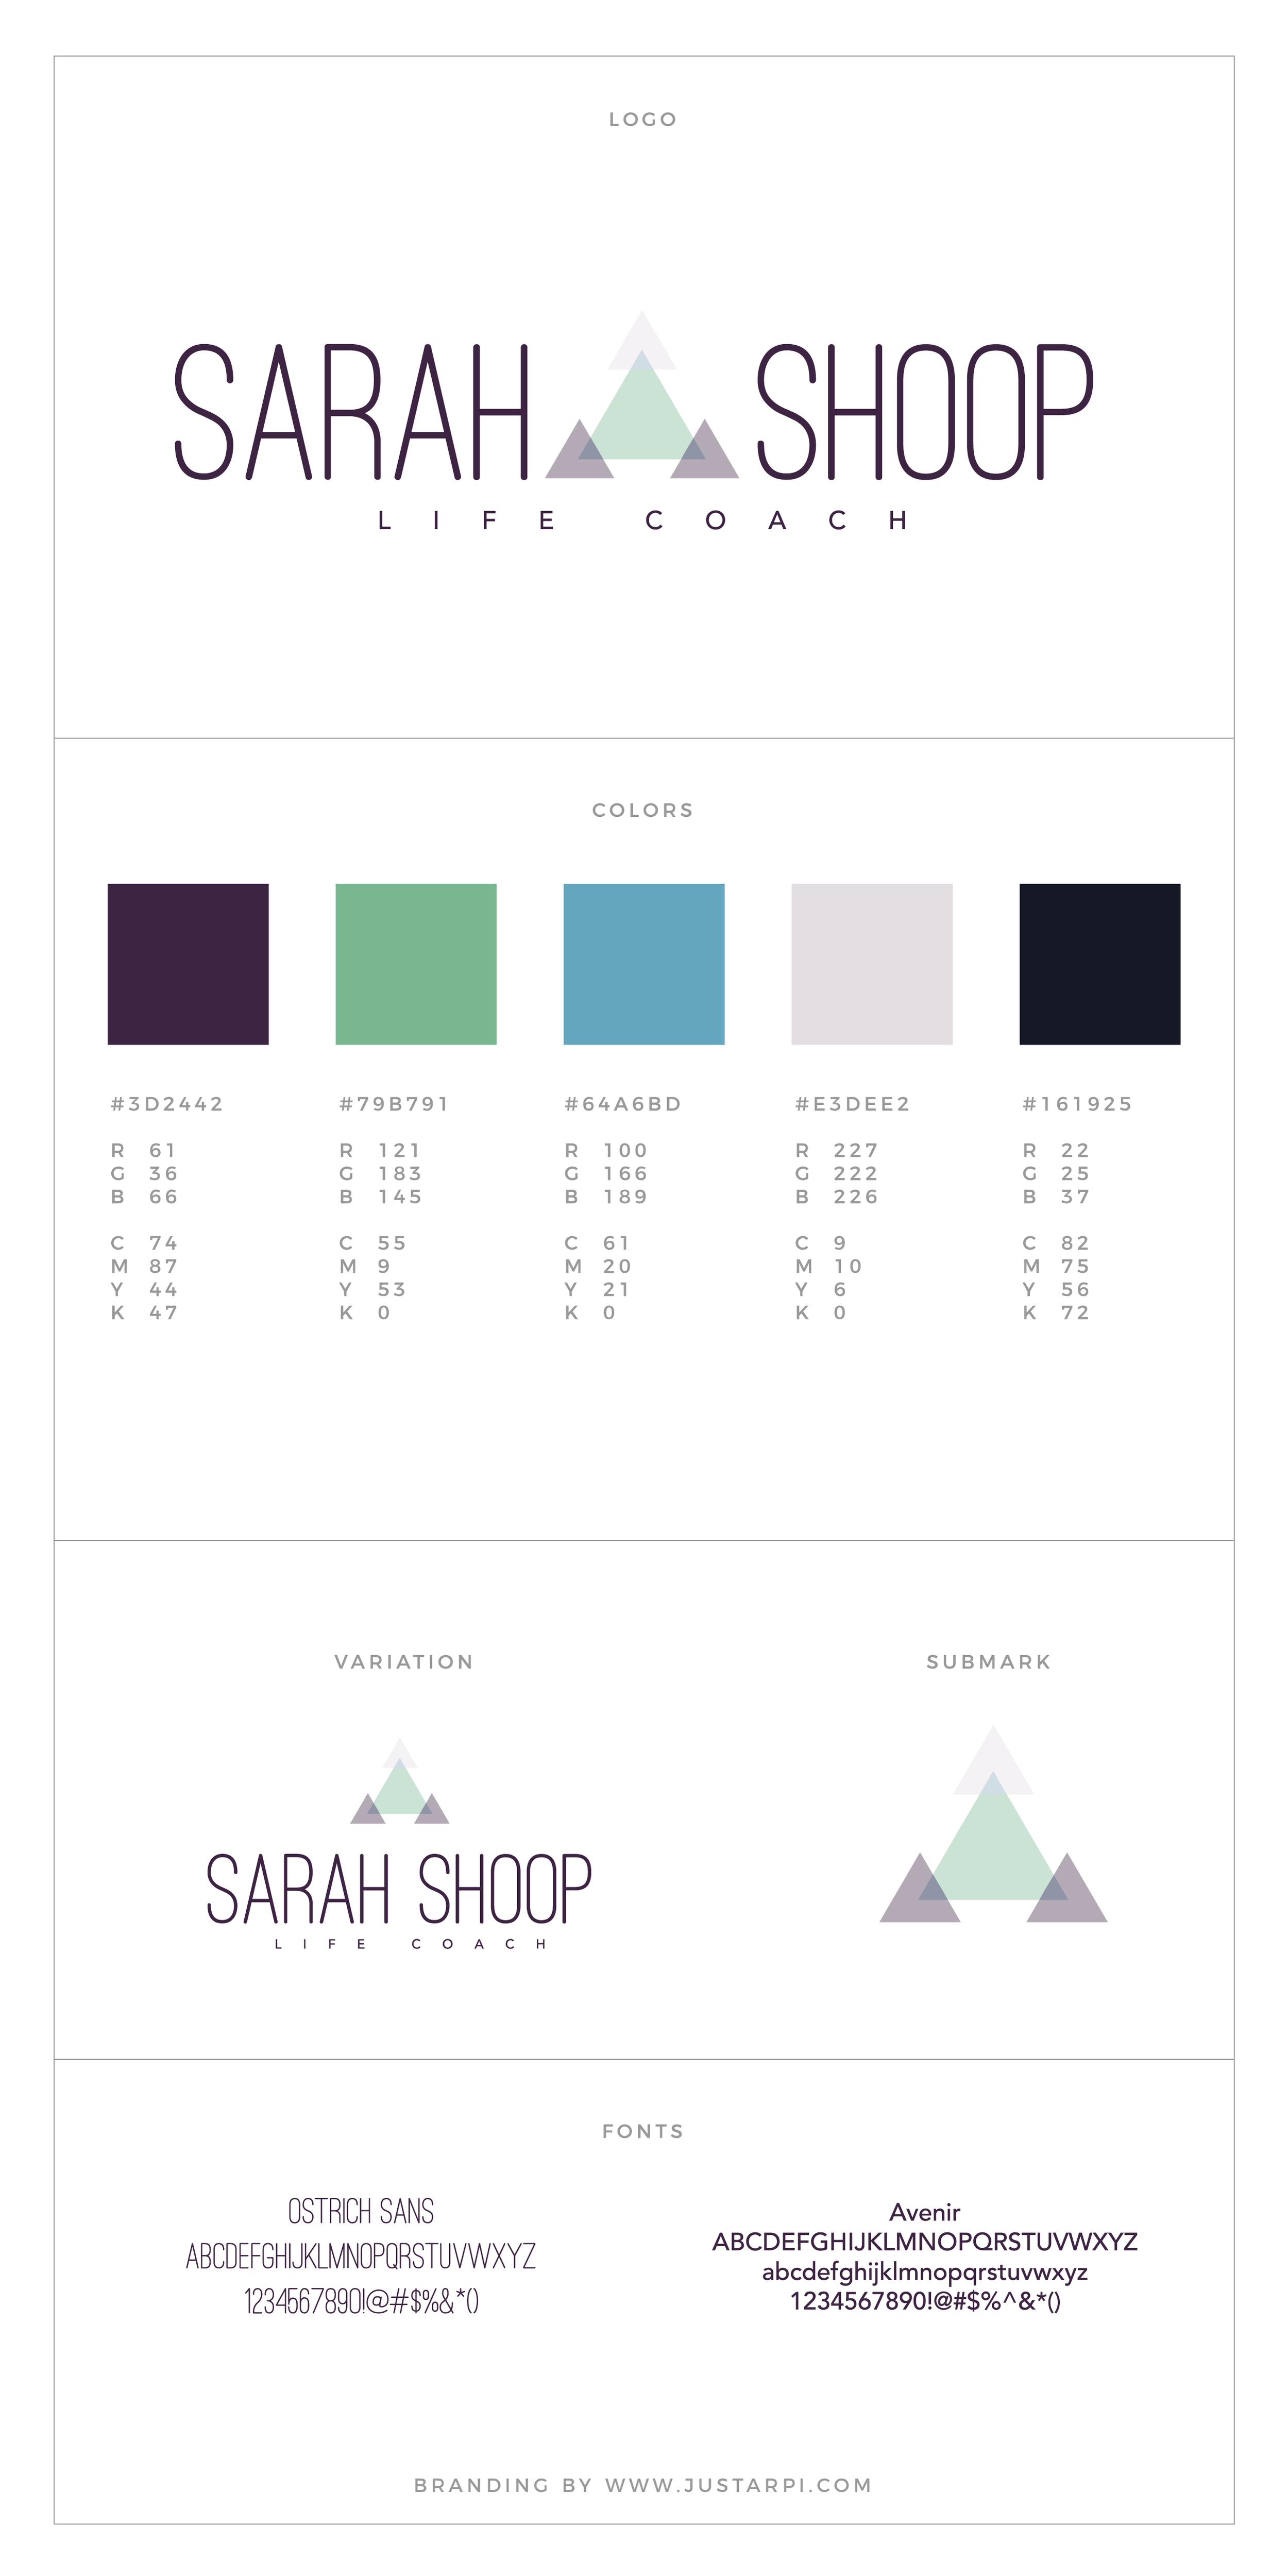 Sarah-Shoop-04.png